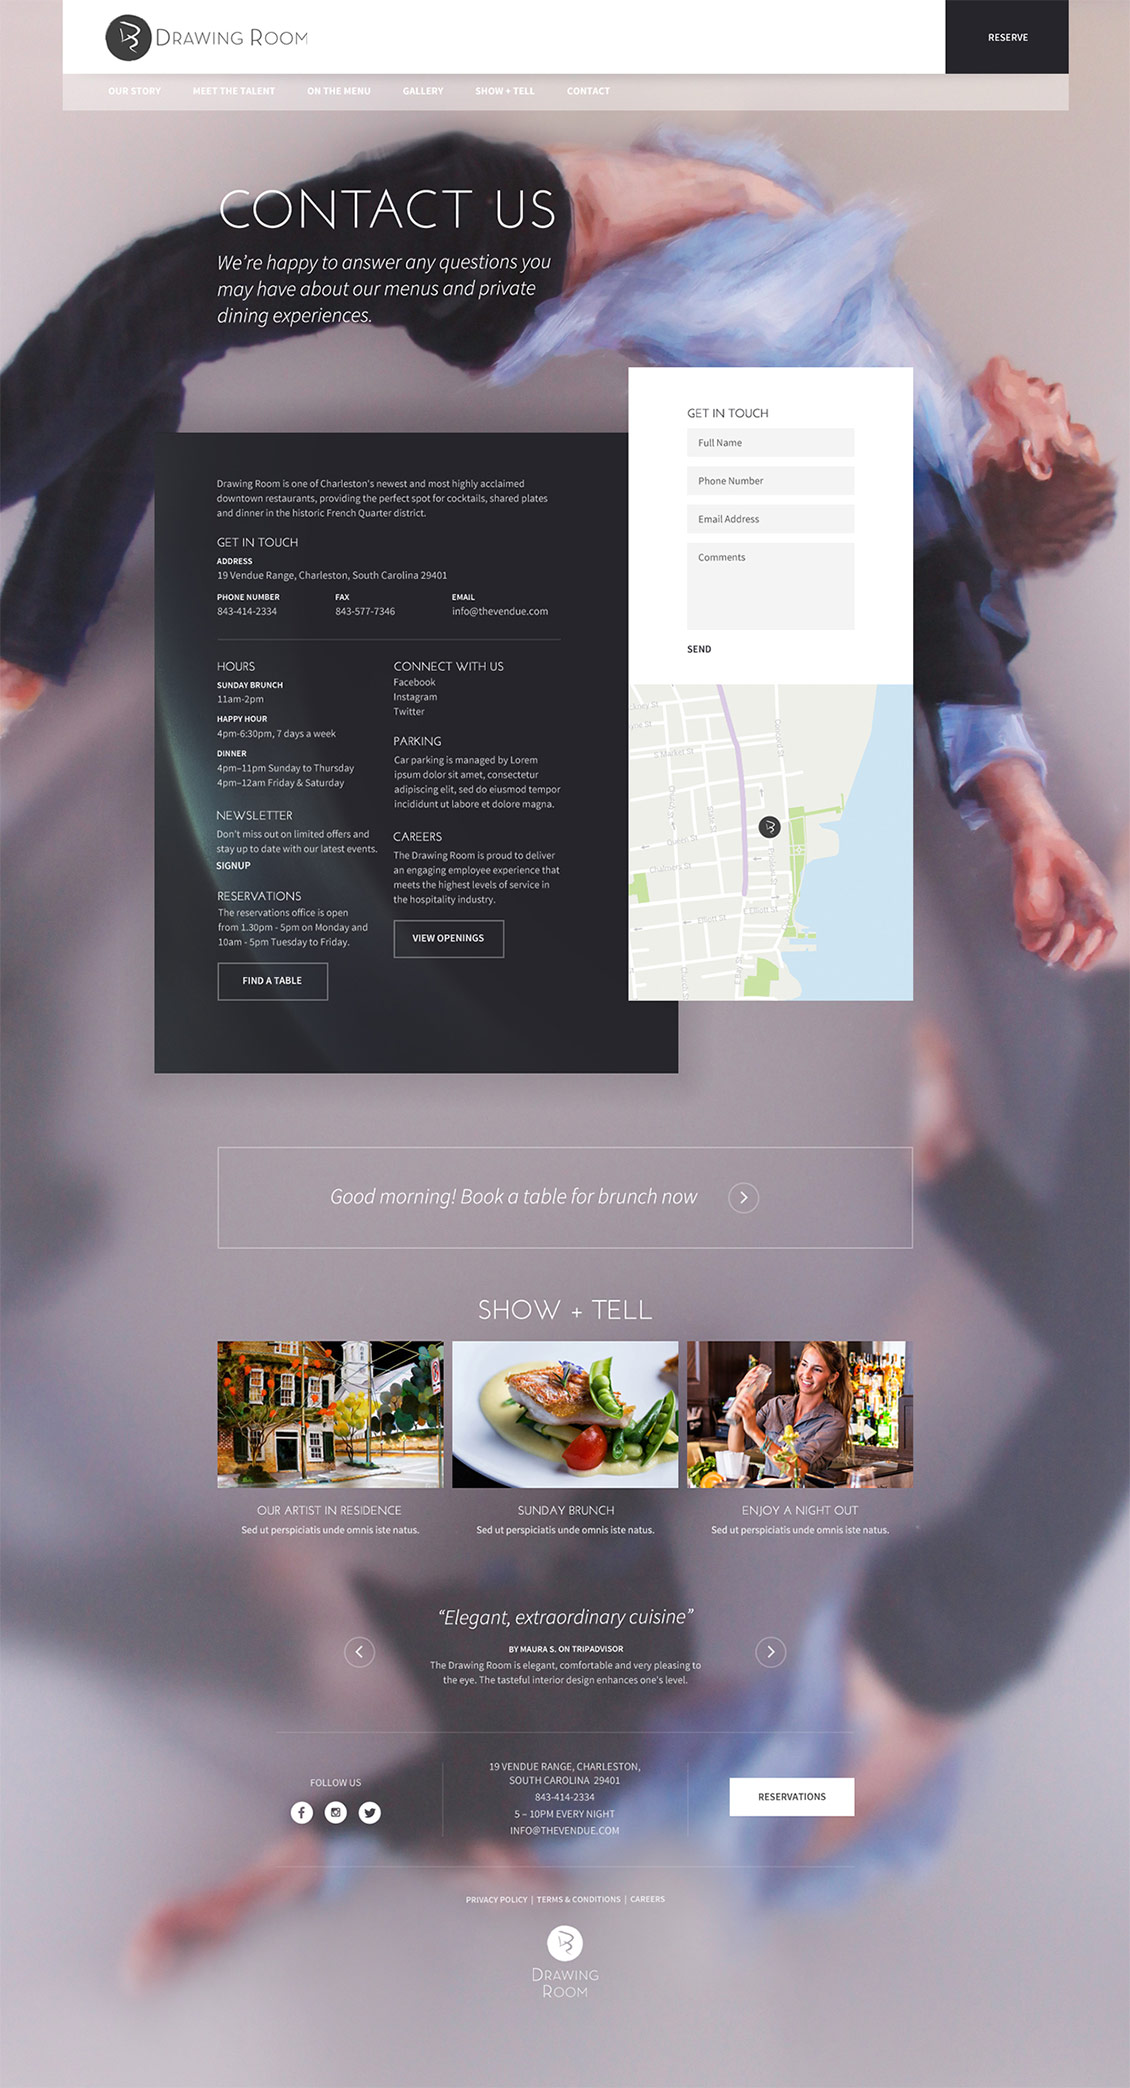 国外Drawing Room餐厅网站设计欣赏